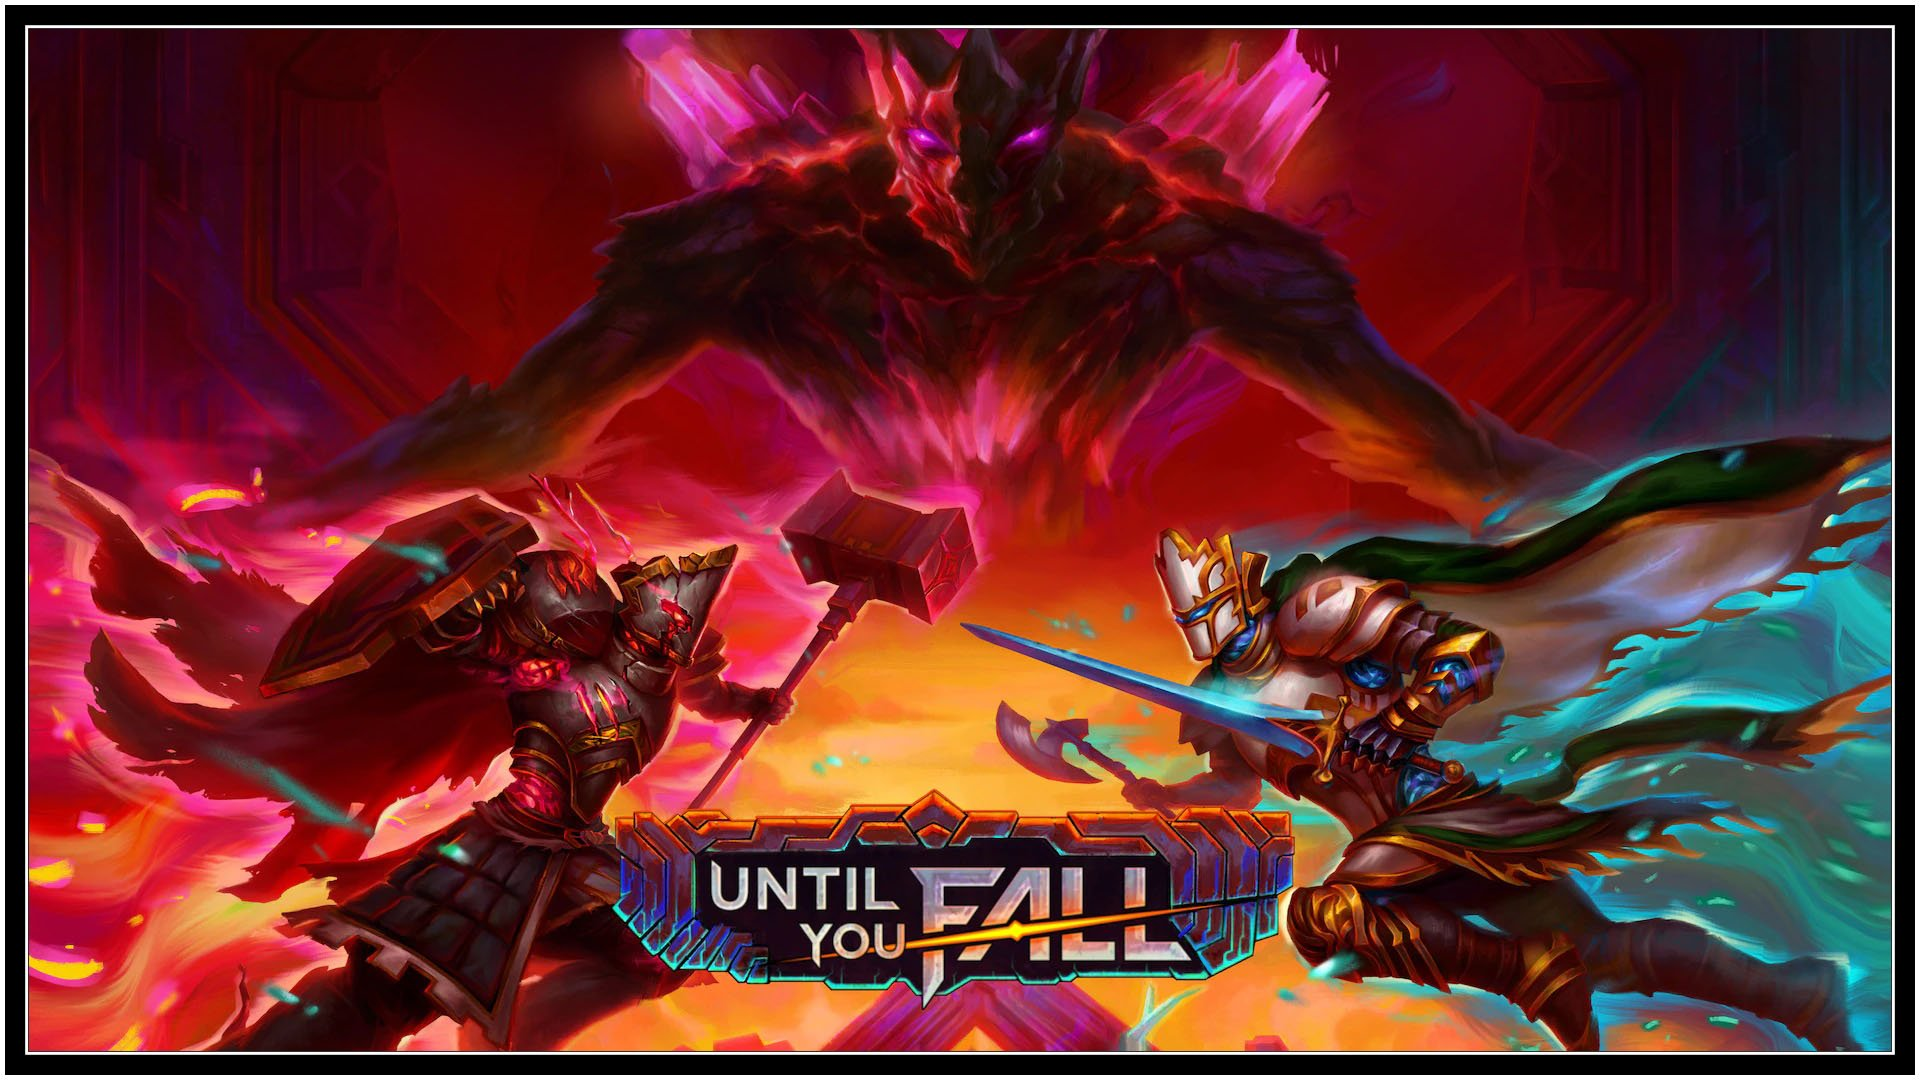 Until You Fall Fi3